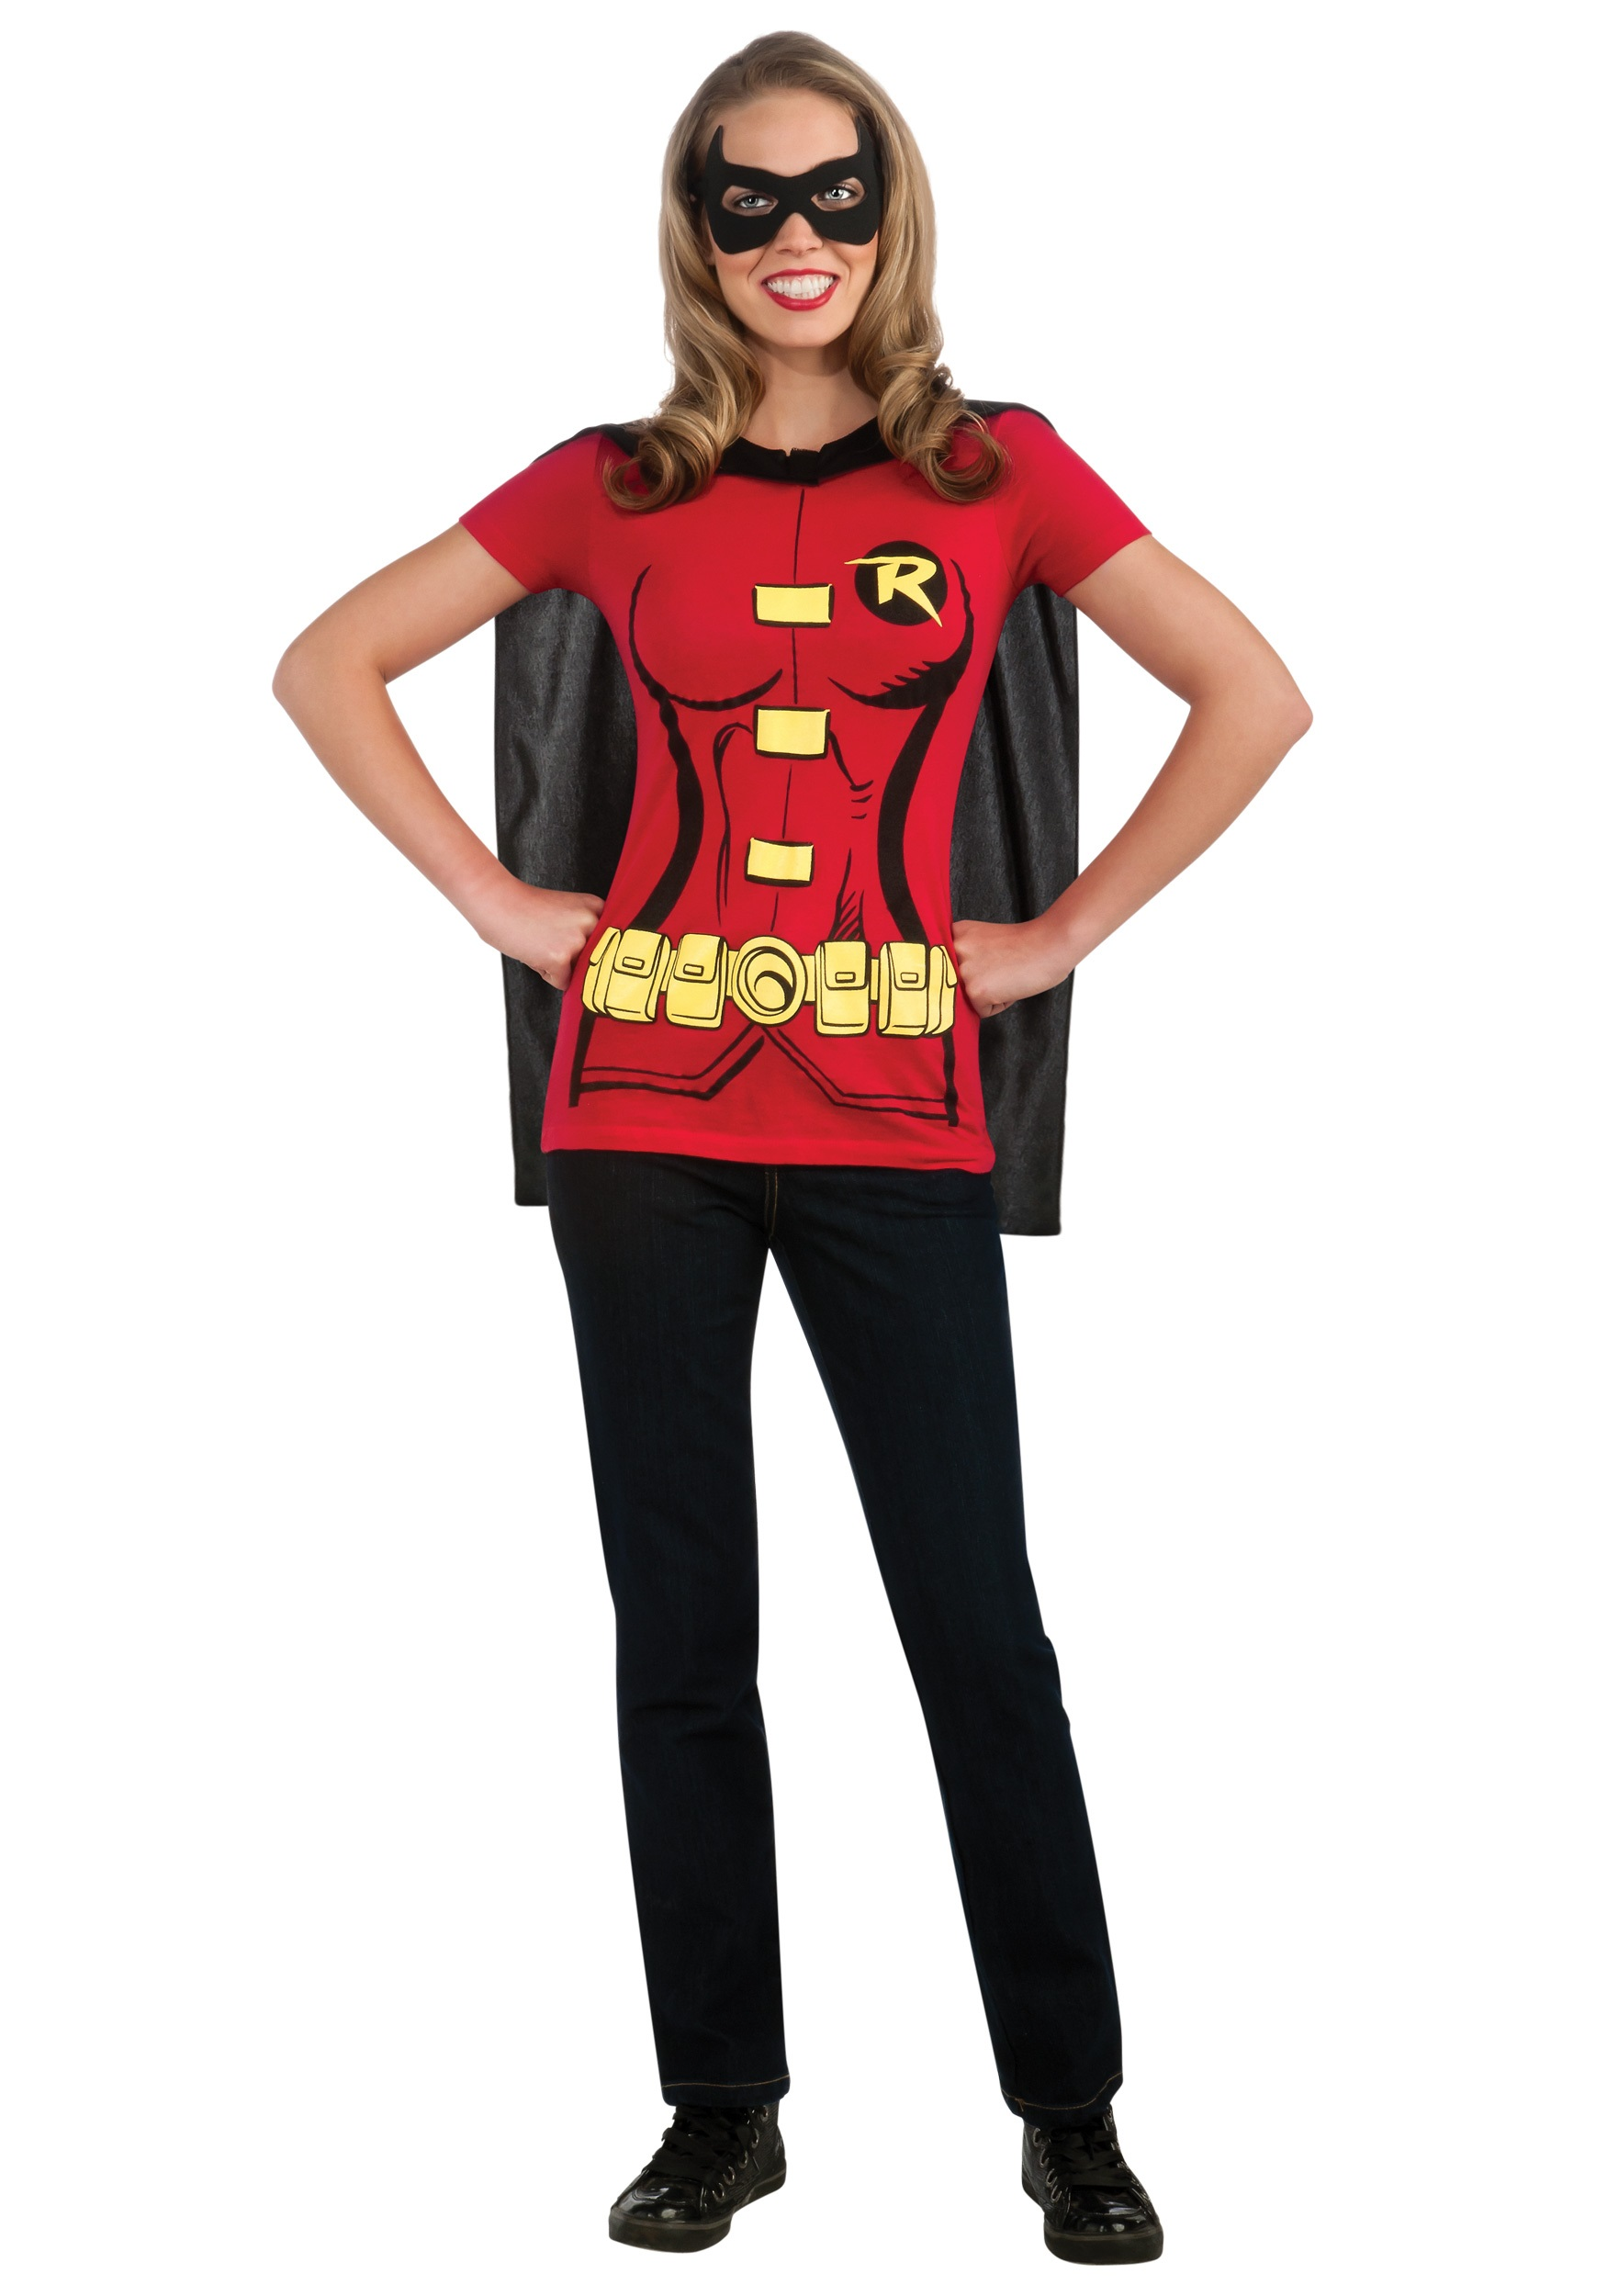 C956 Superhero T Shirt Women Costume Wonder Woman Robin